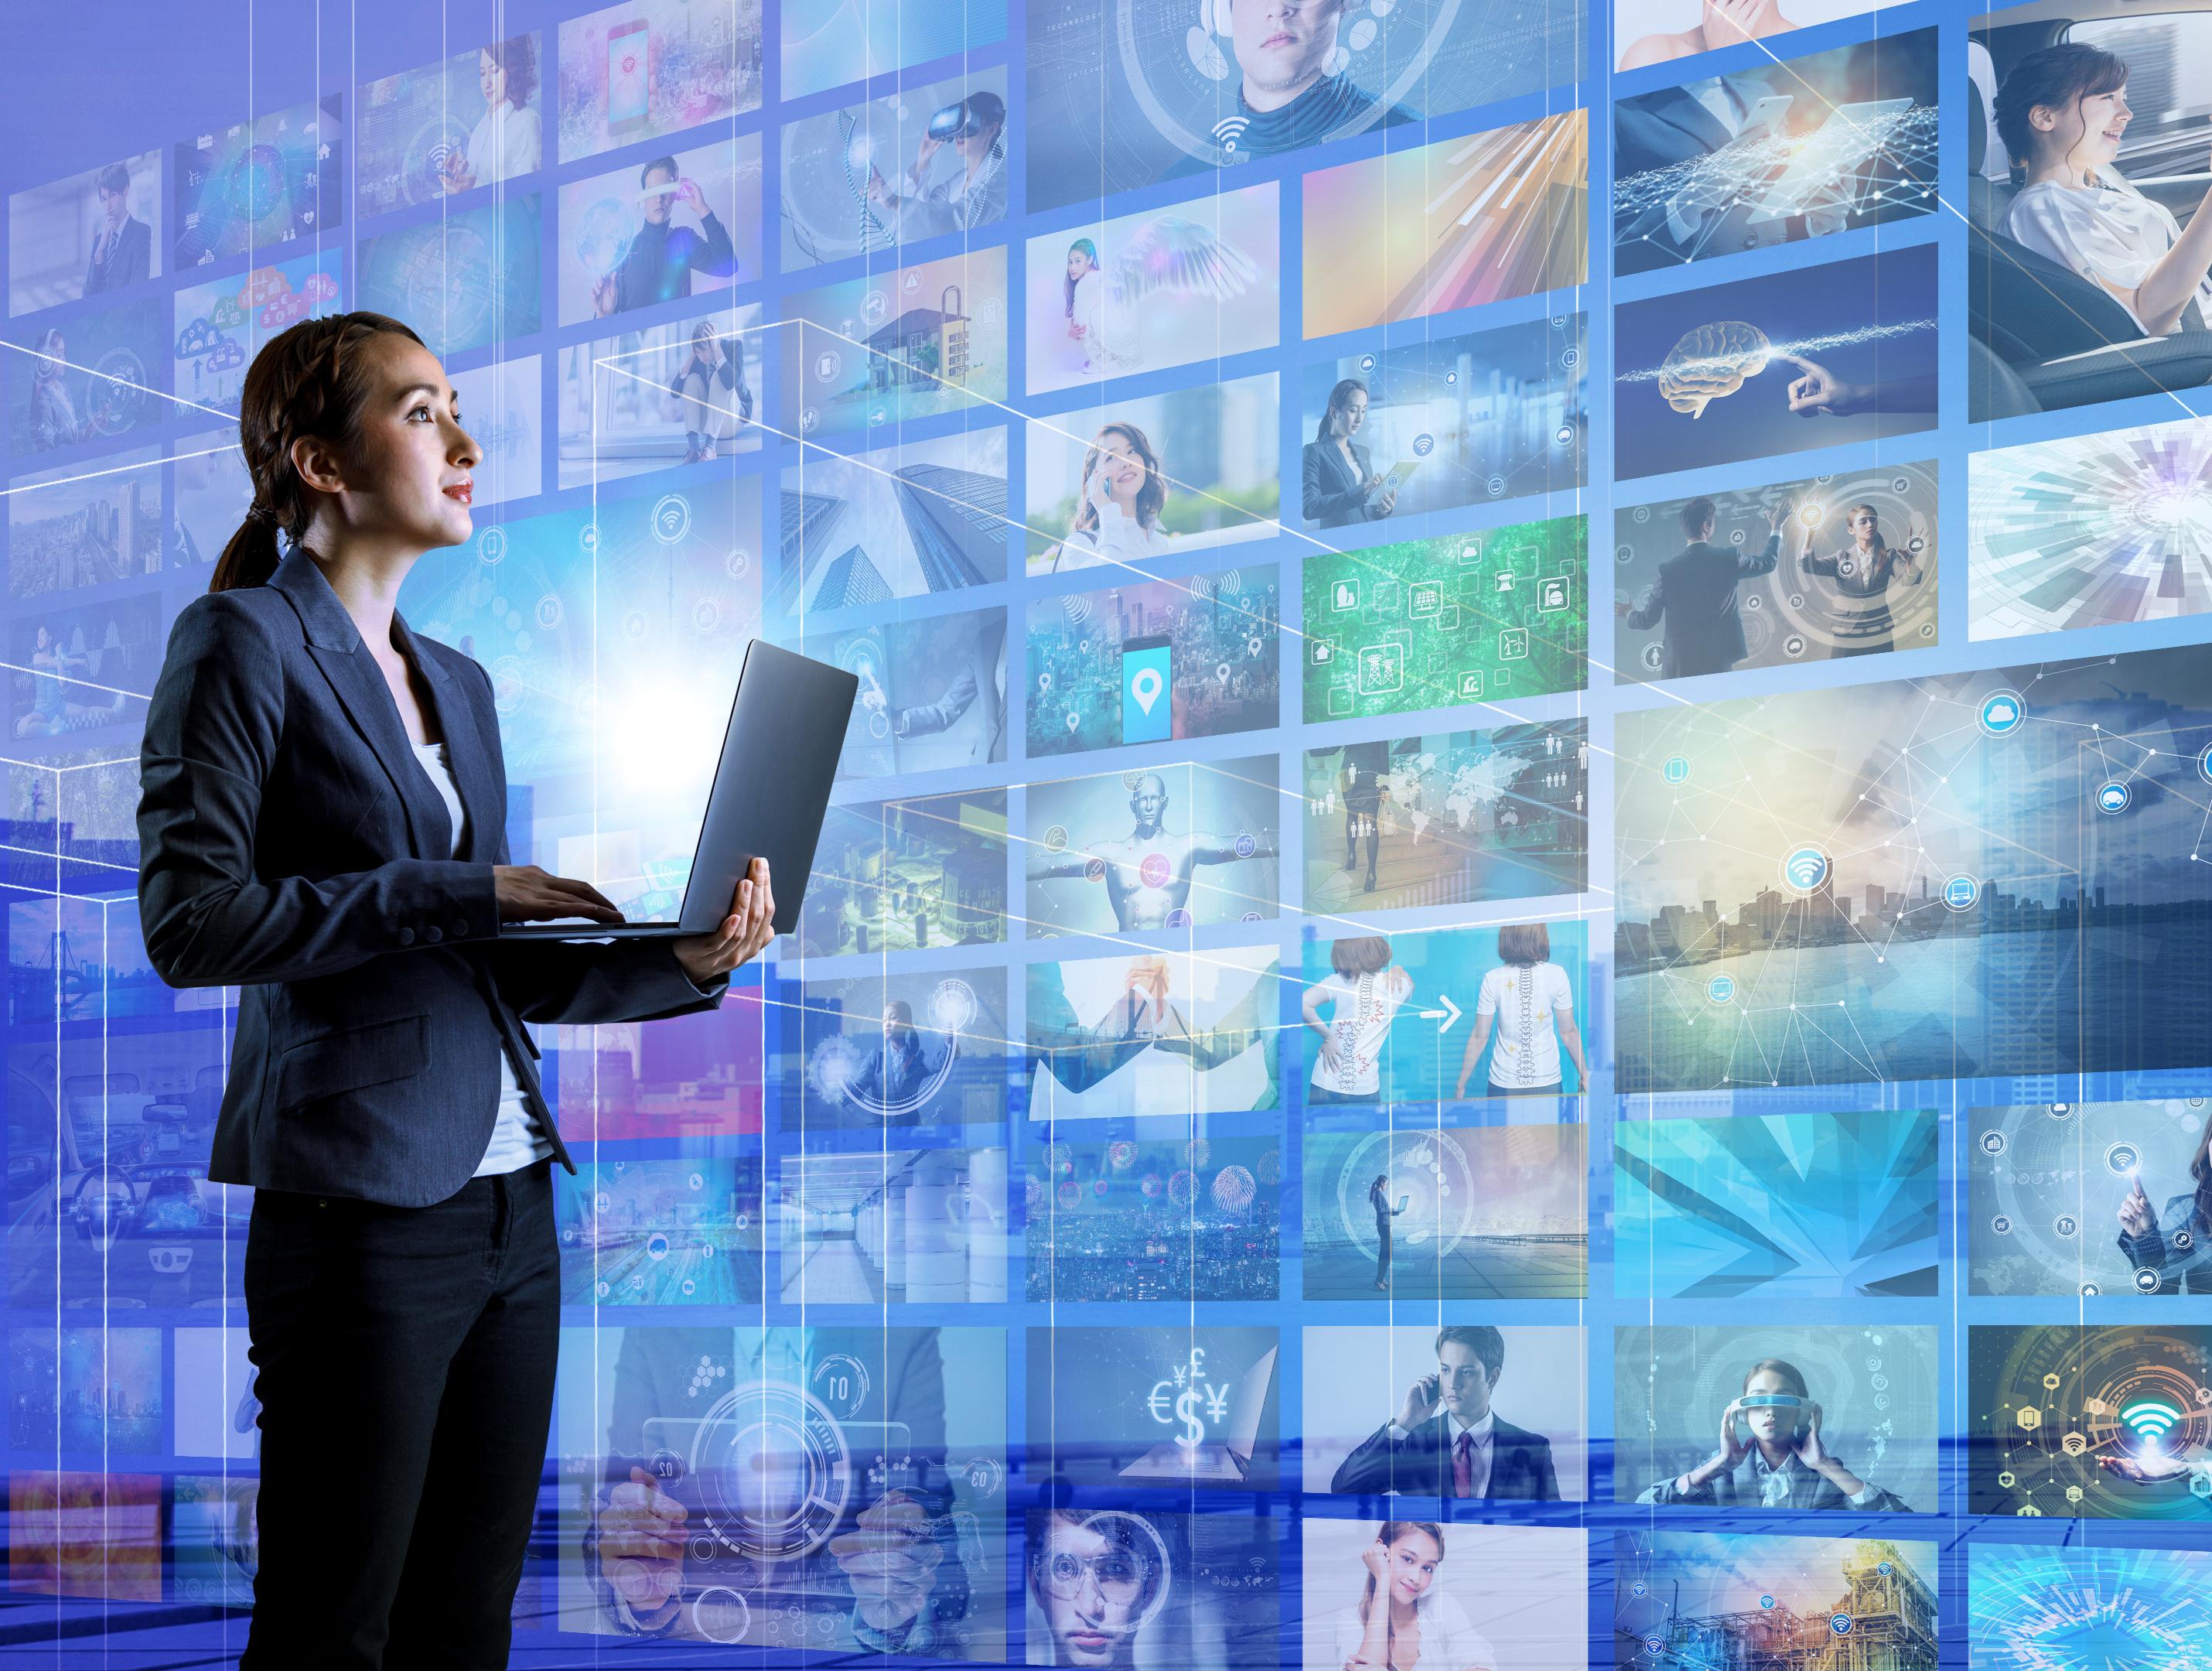 tv business strategies